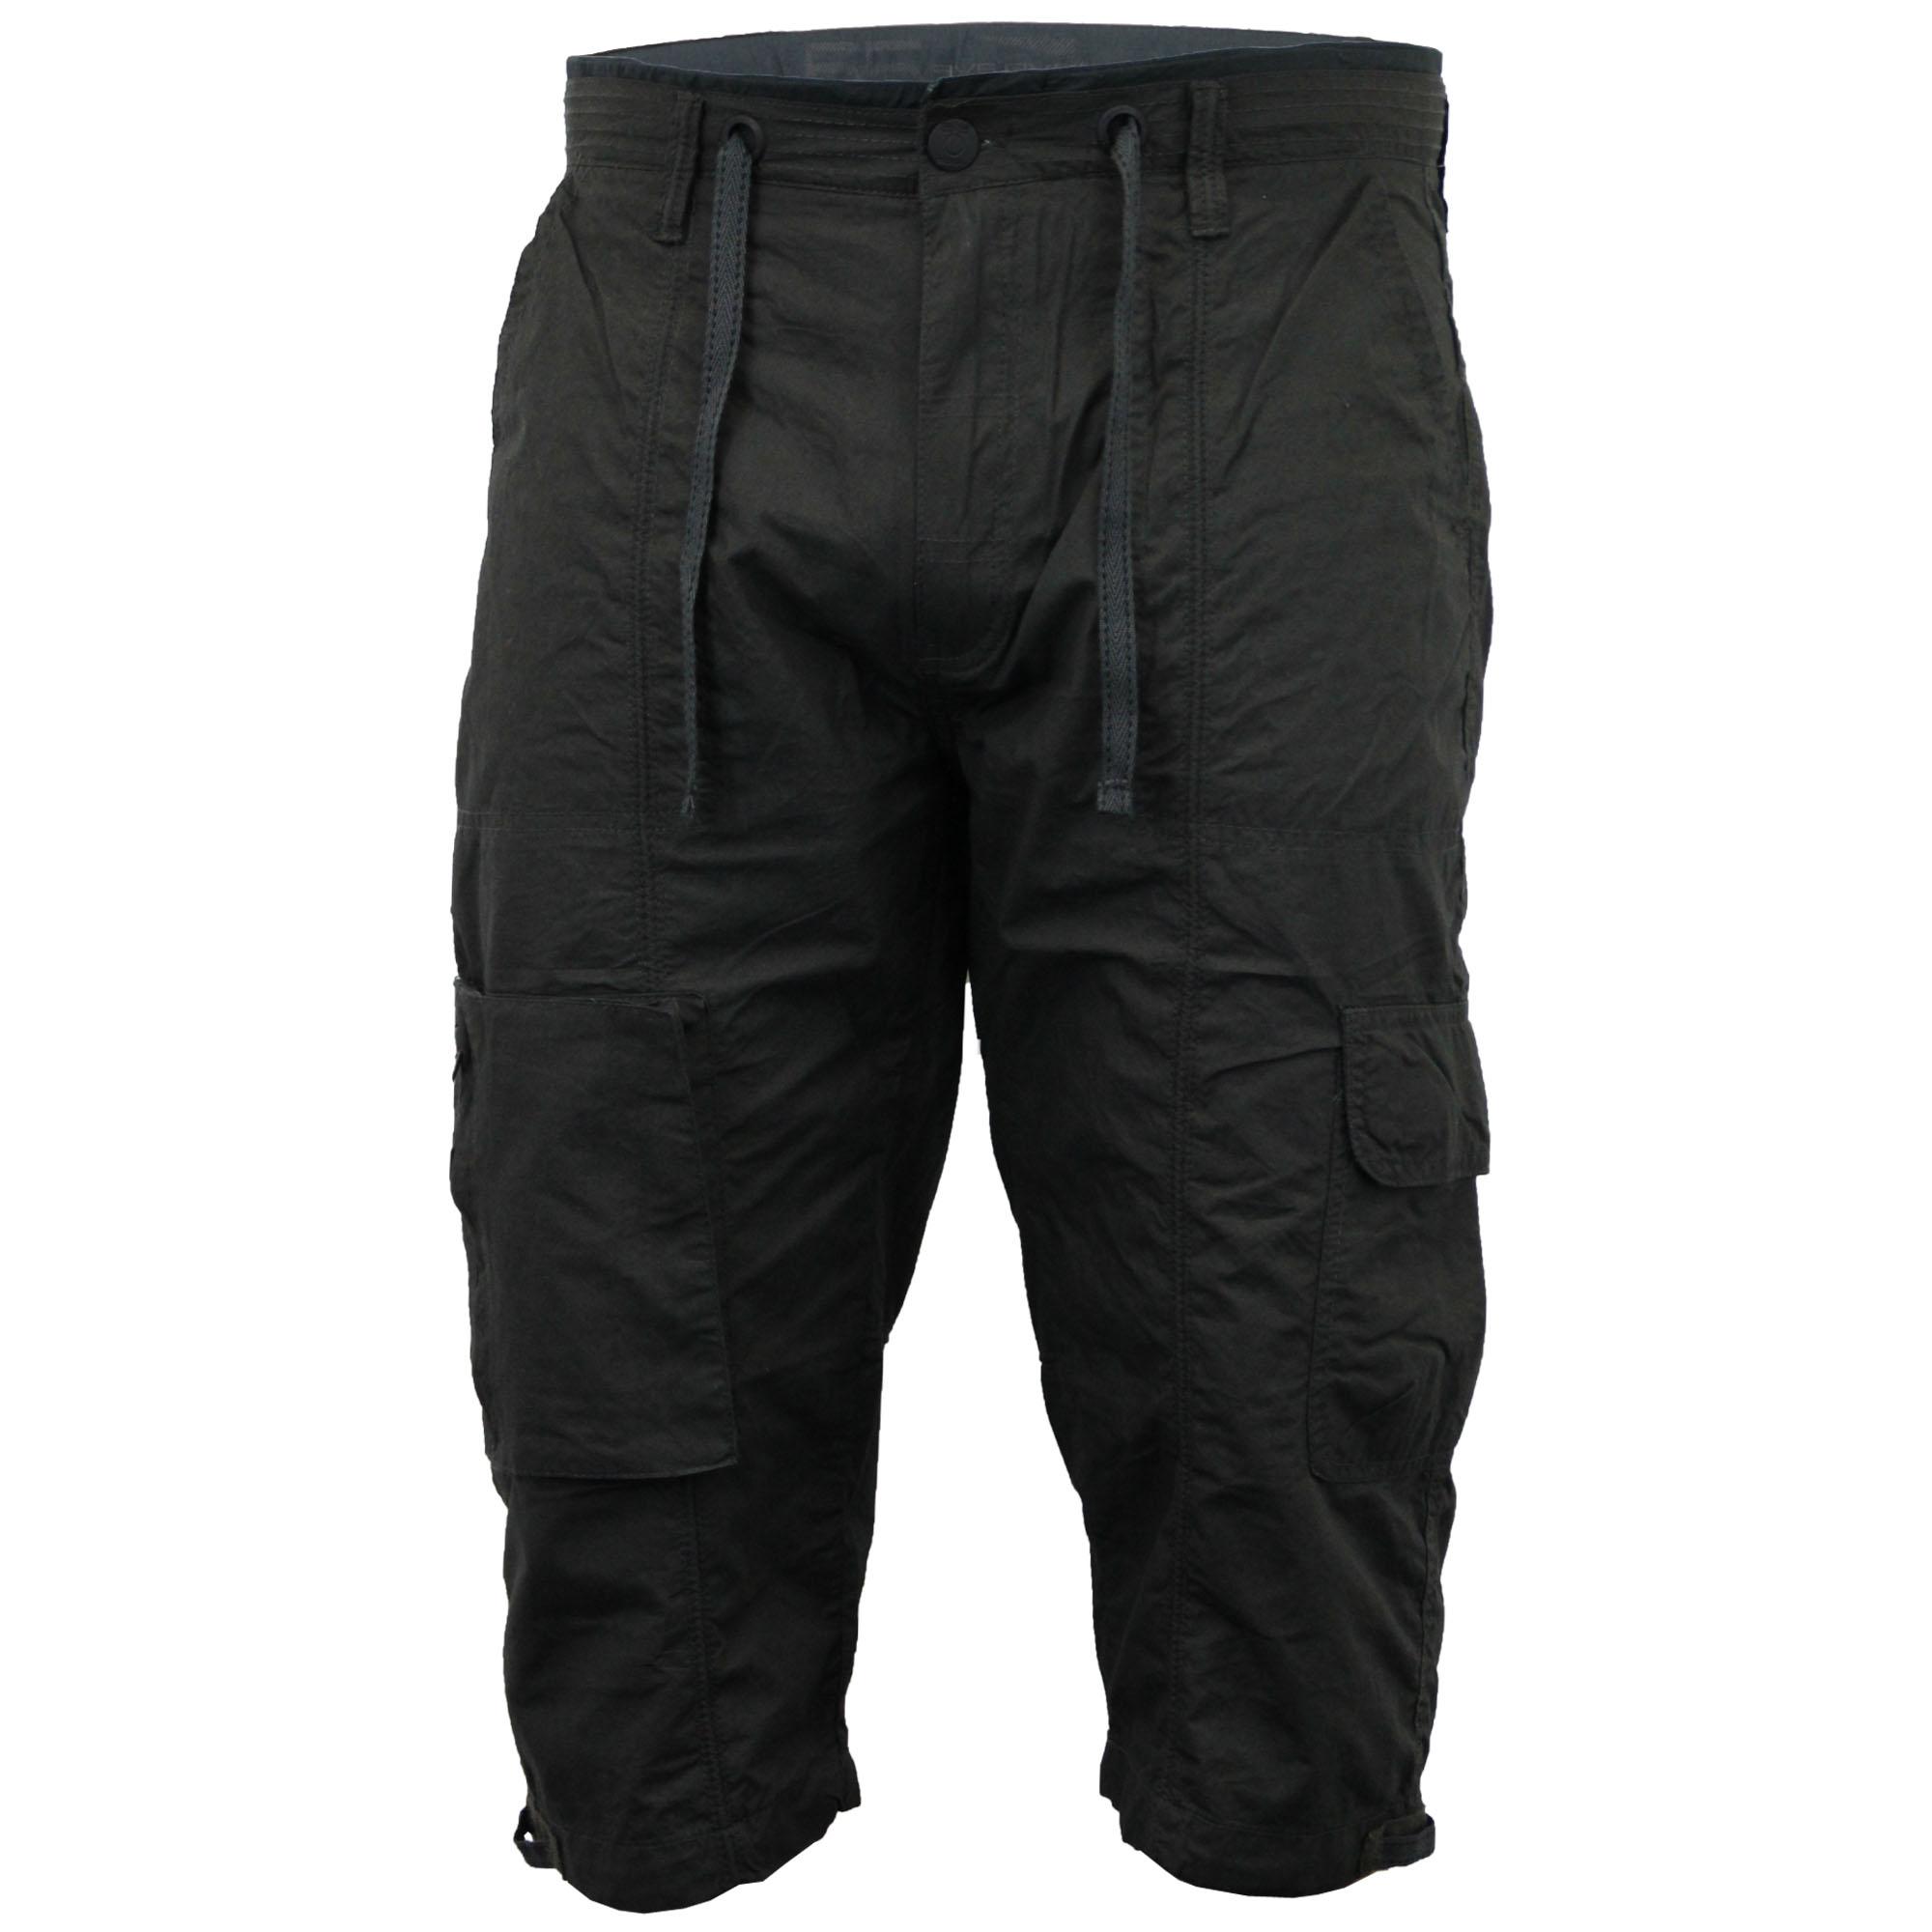 Mens Shorts 55 Soul Combat Cargo Bottoms Half Pants 3 4 ...